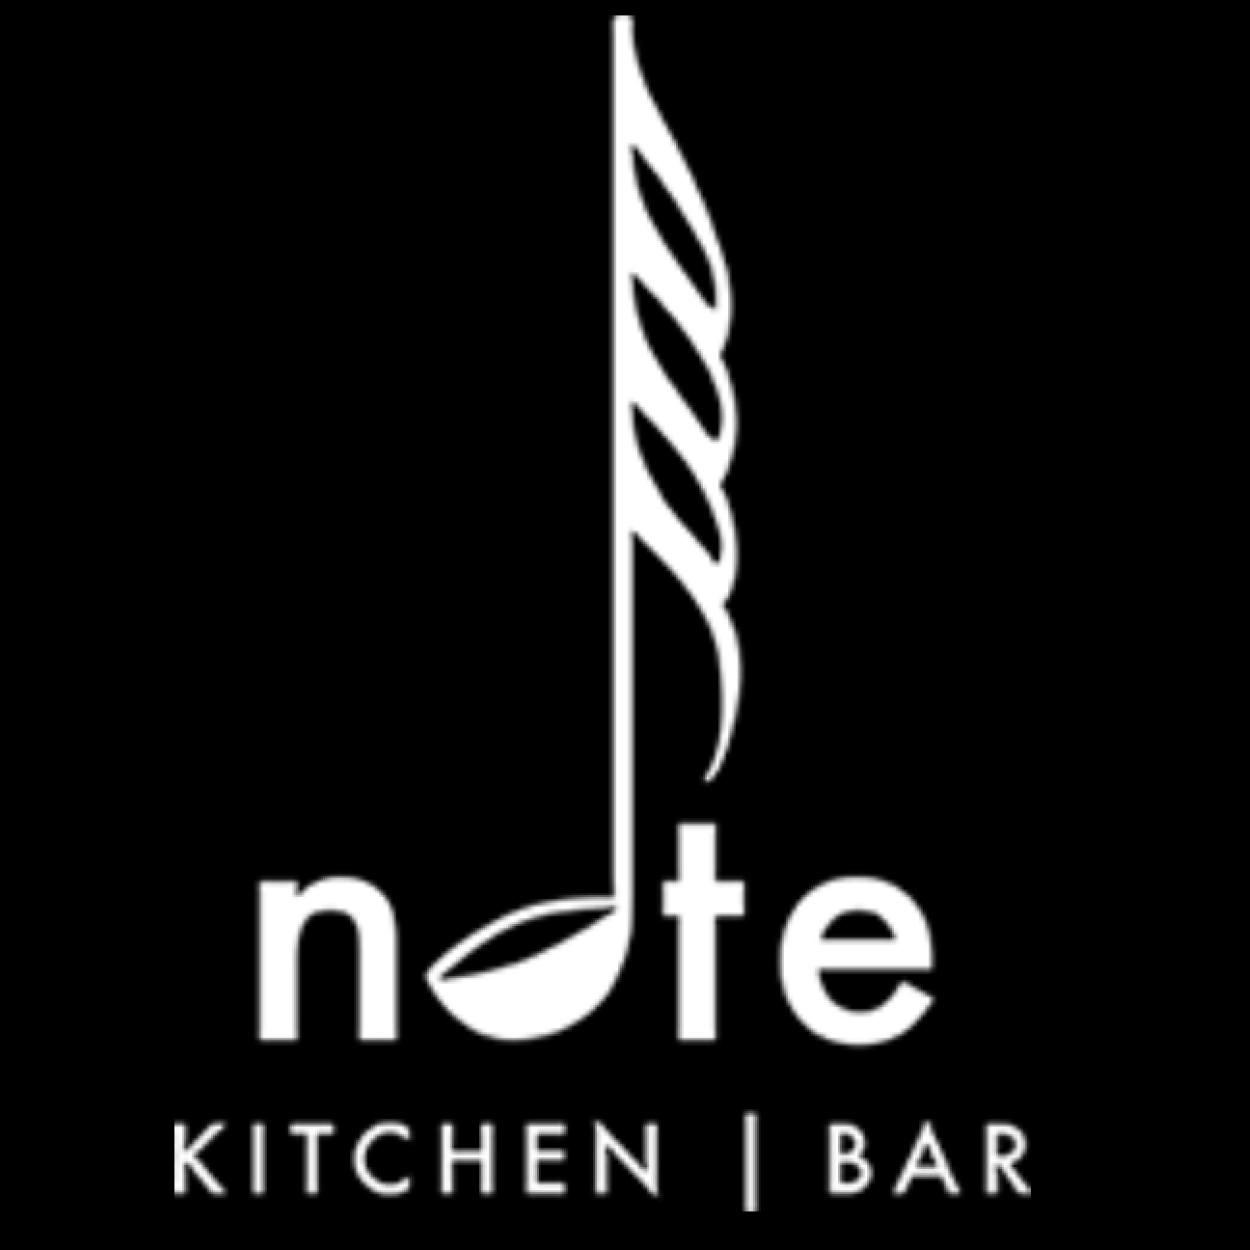 Note Kitche & Bar logo